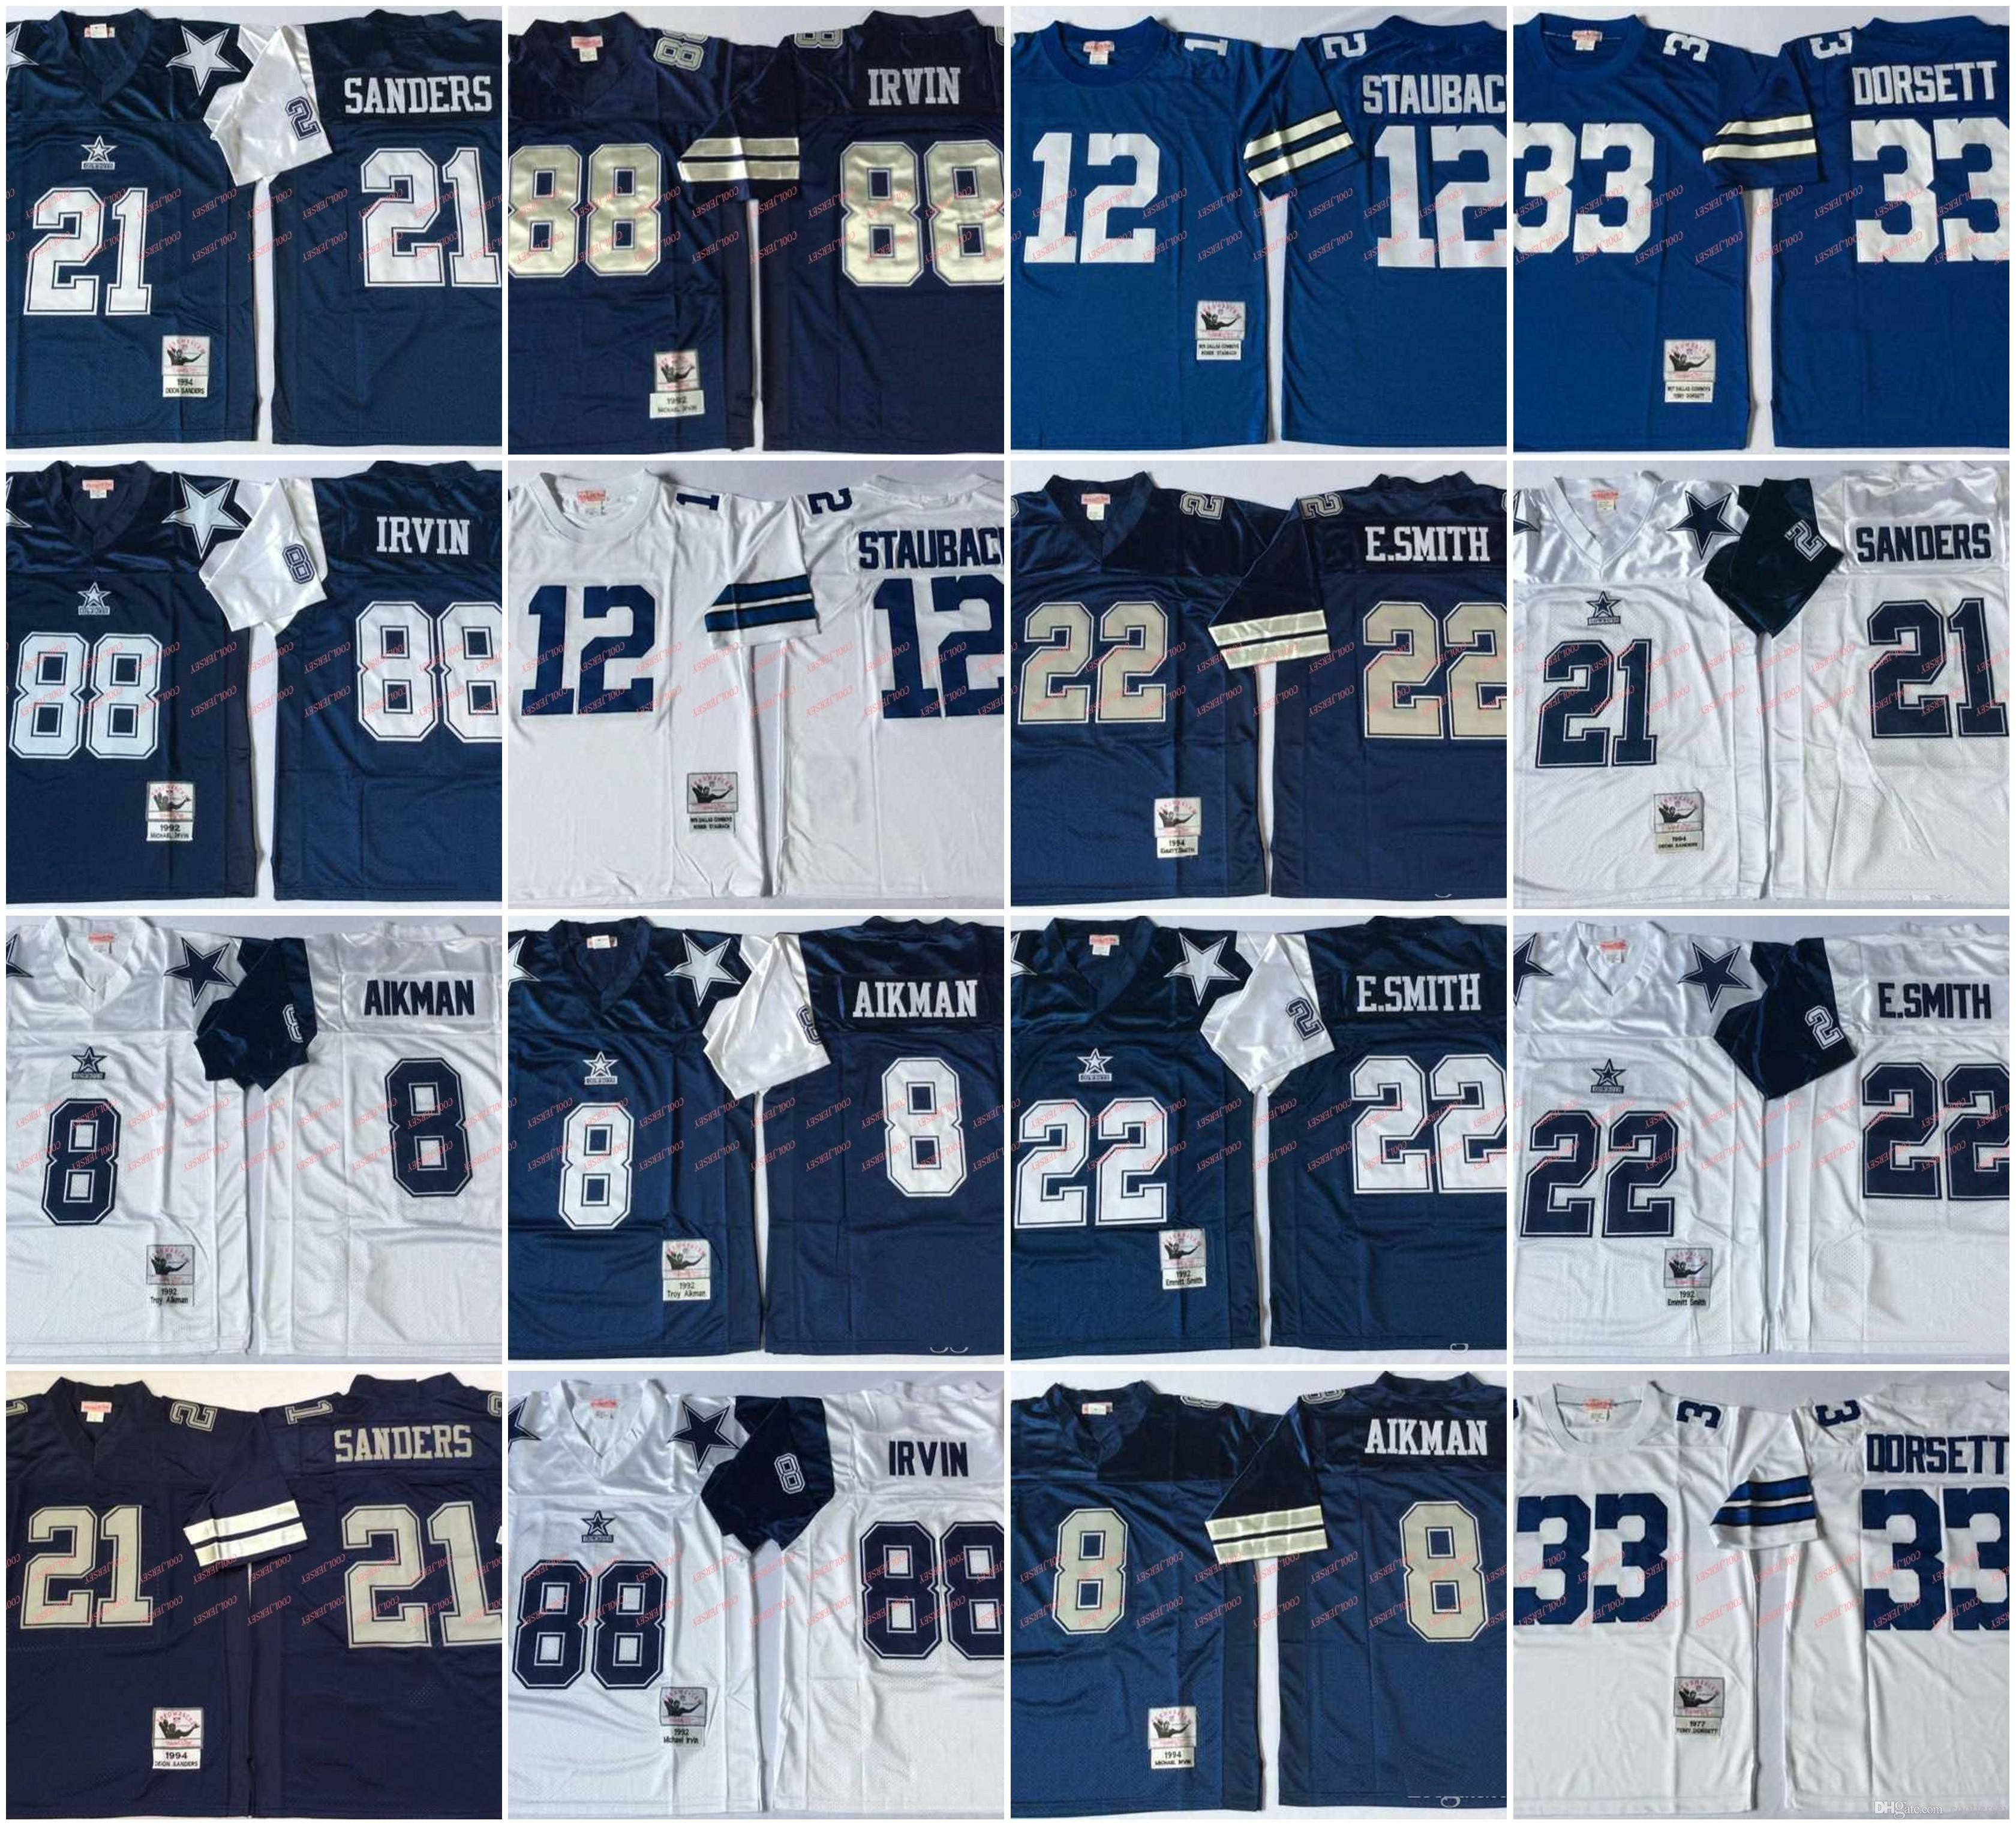 8 Troy Aikman Vintage Jersey 21 Deion Sanders 12 Roger Staubach 22 ... 7146d9b4c